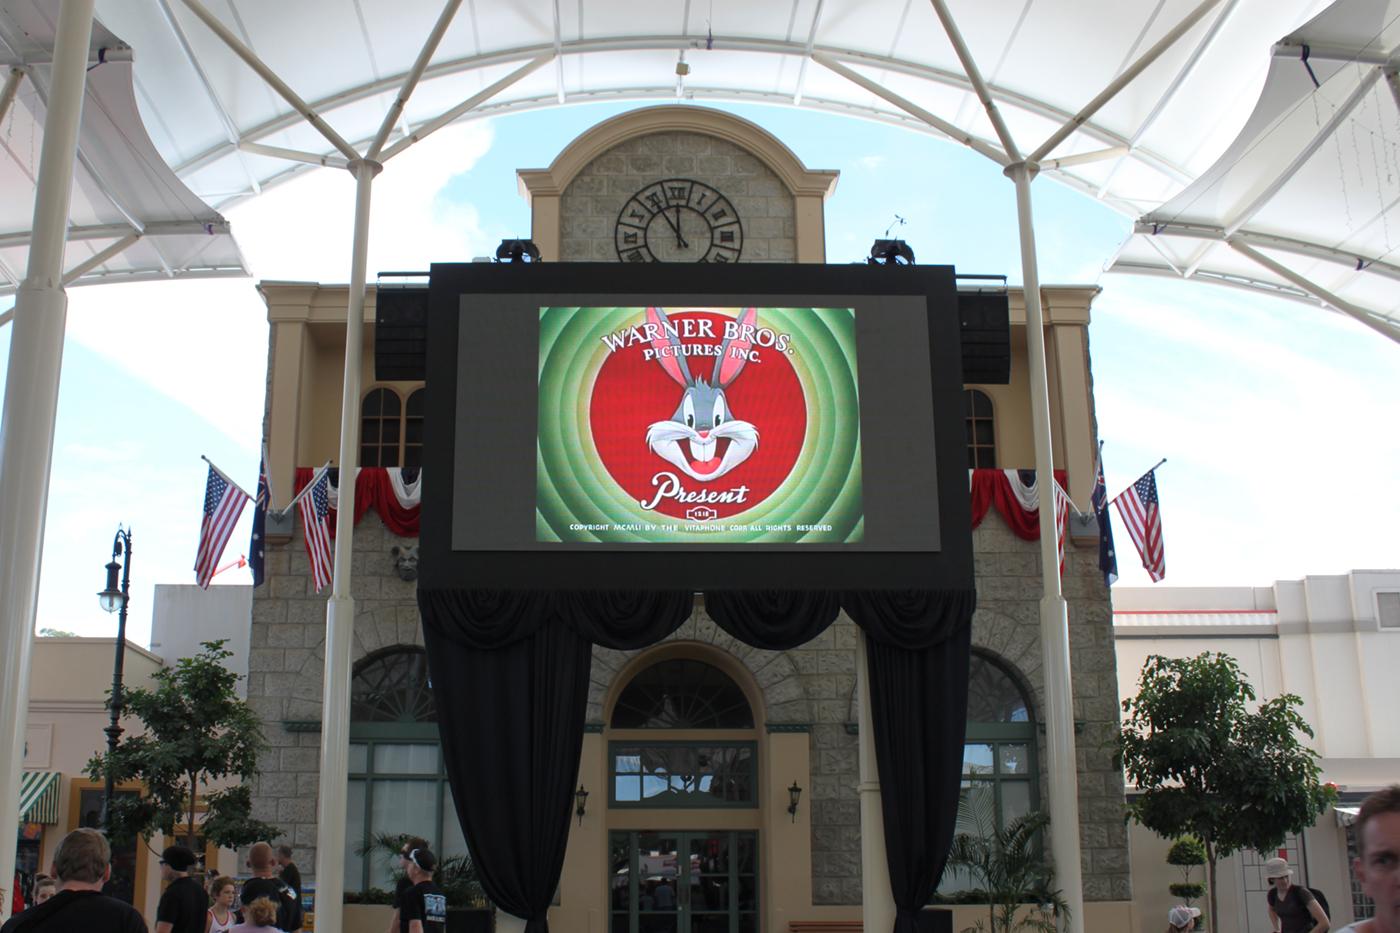 Movie World Gold Coast Outdoor Big Screen LED Billboard Digital Advertising